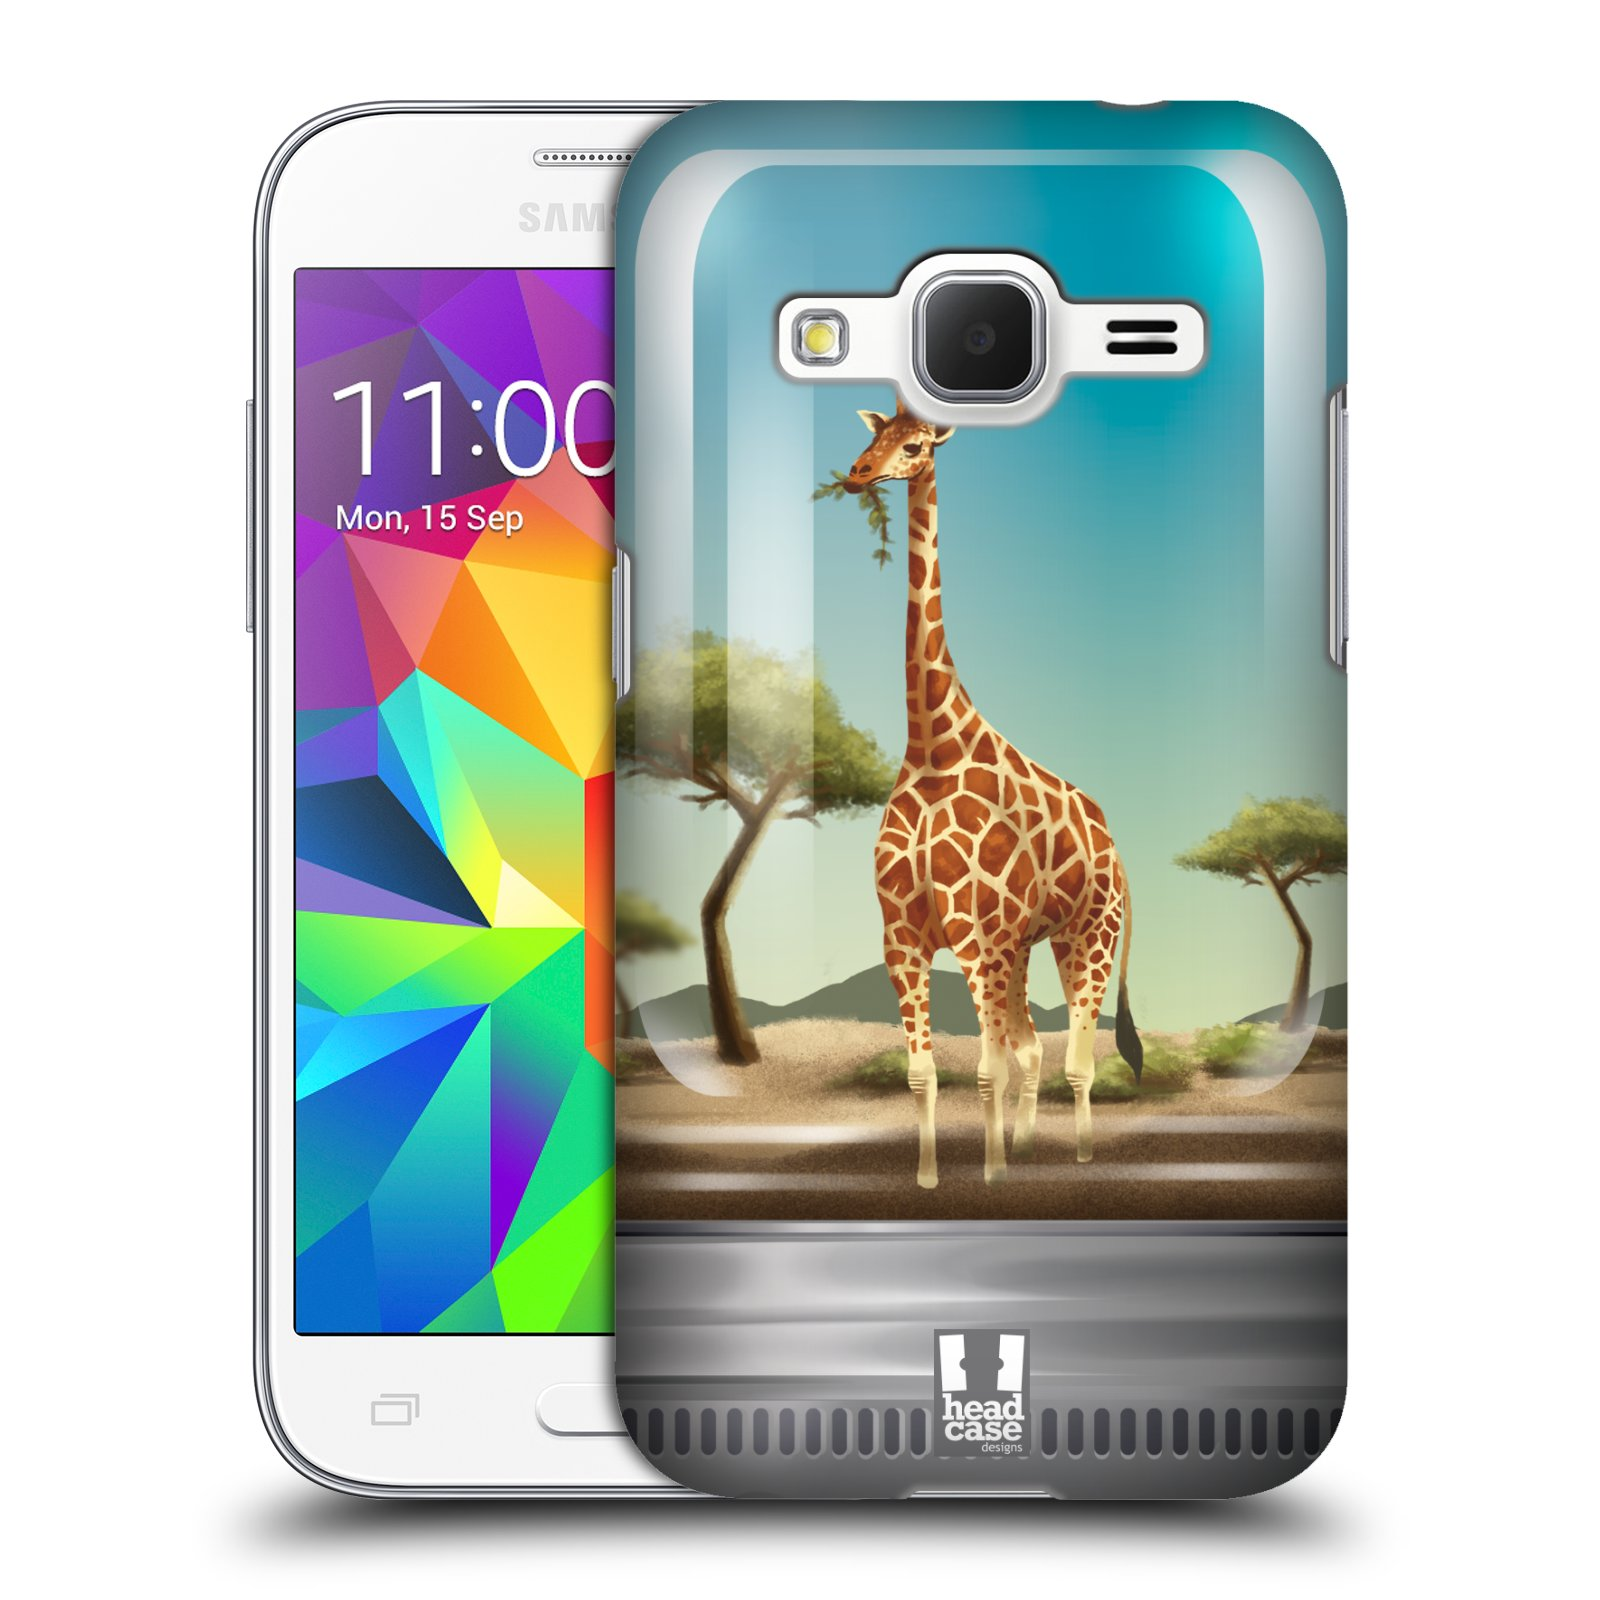 HEAD CASE plastový obal na mobil SAMSUNG GALAXY Core Prime (Core Prime VE) vzor Zvířátka v těžítku žirafa